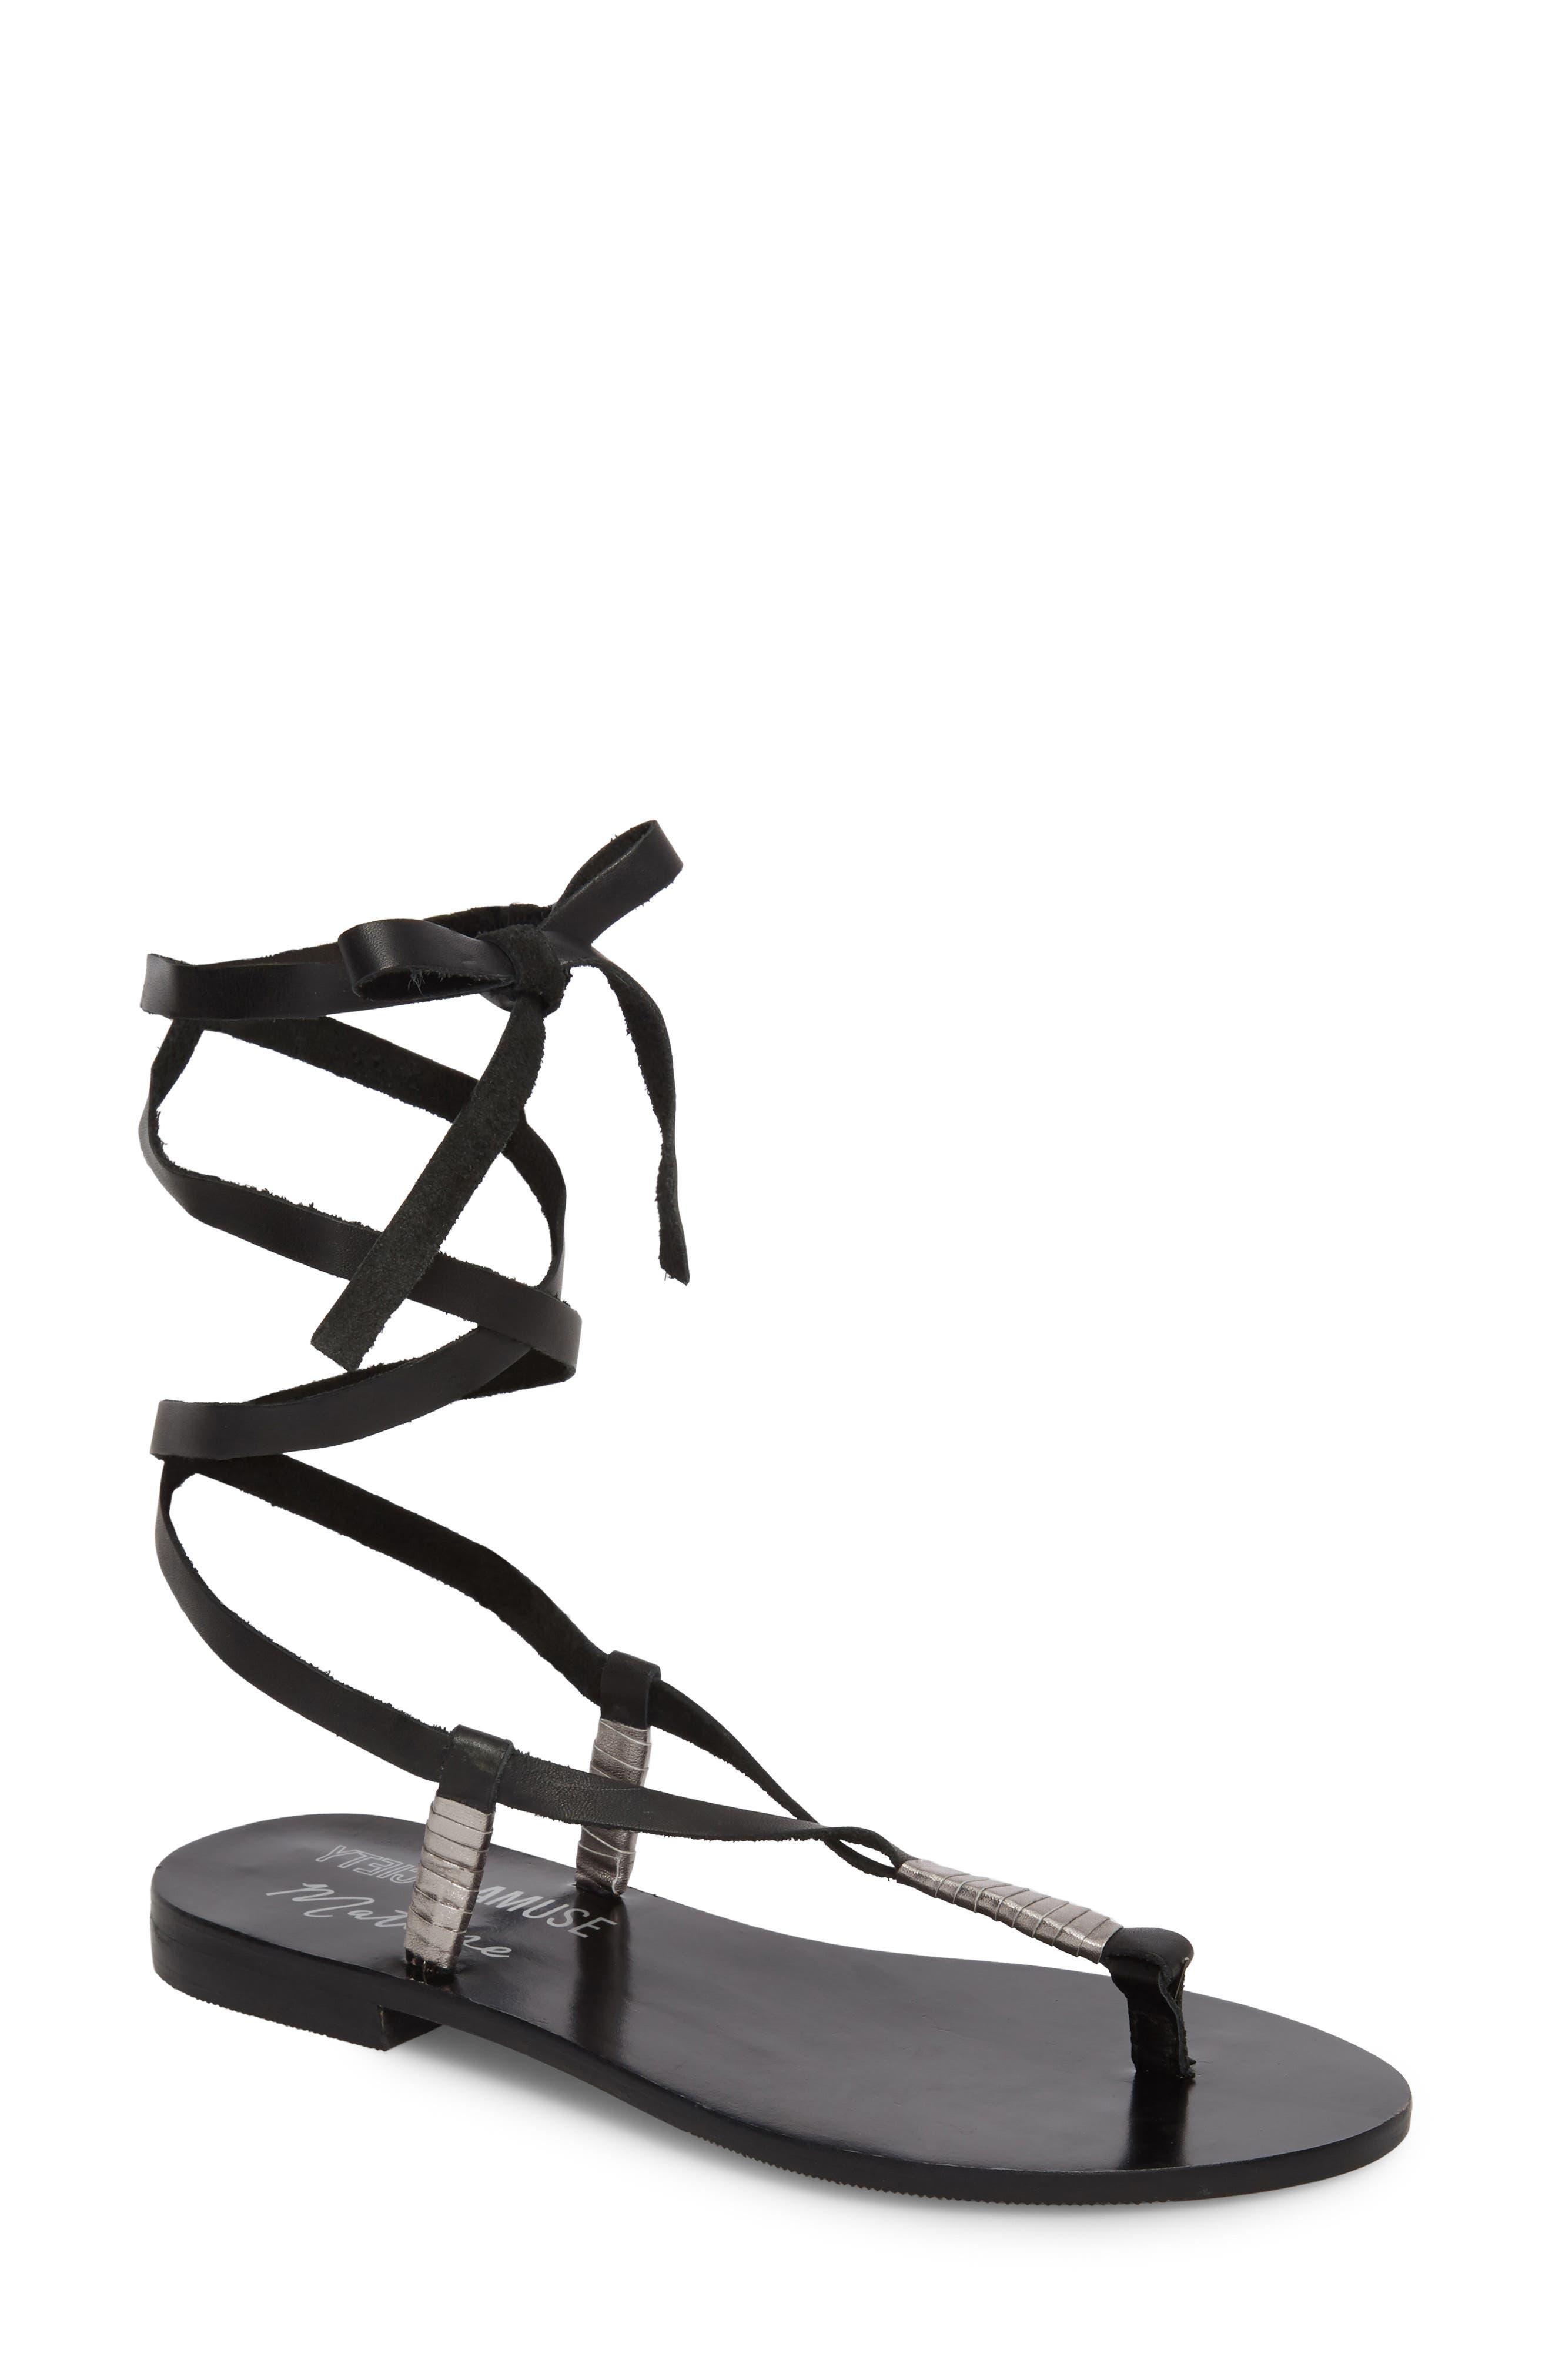 Amuse Society x Matisse Positano Sandal,                             Main thumbnail 1, color,                             Black Leather